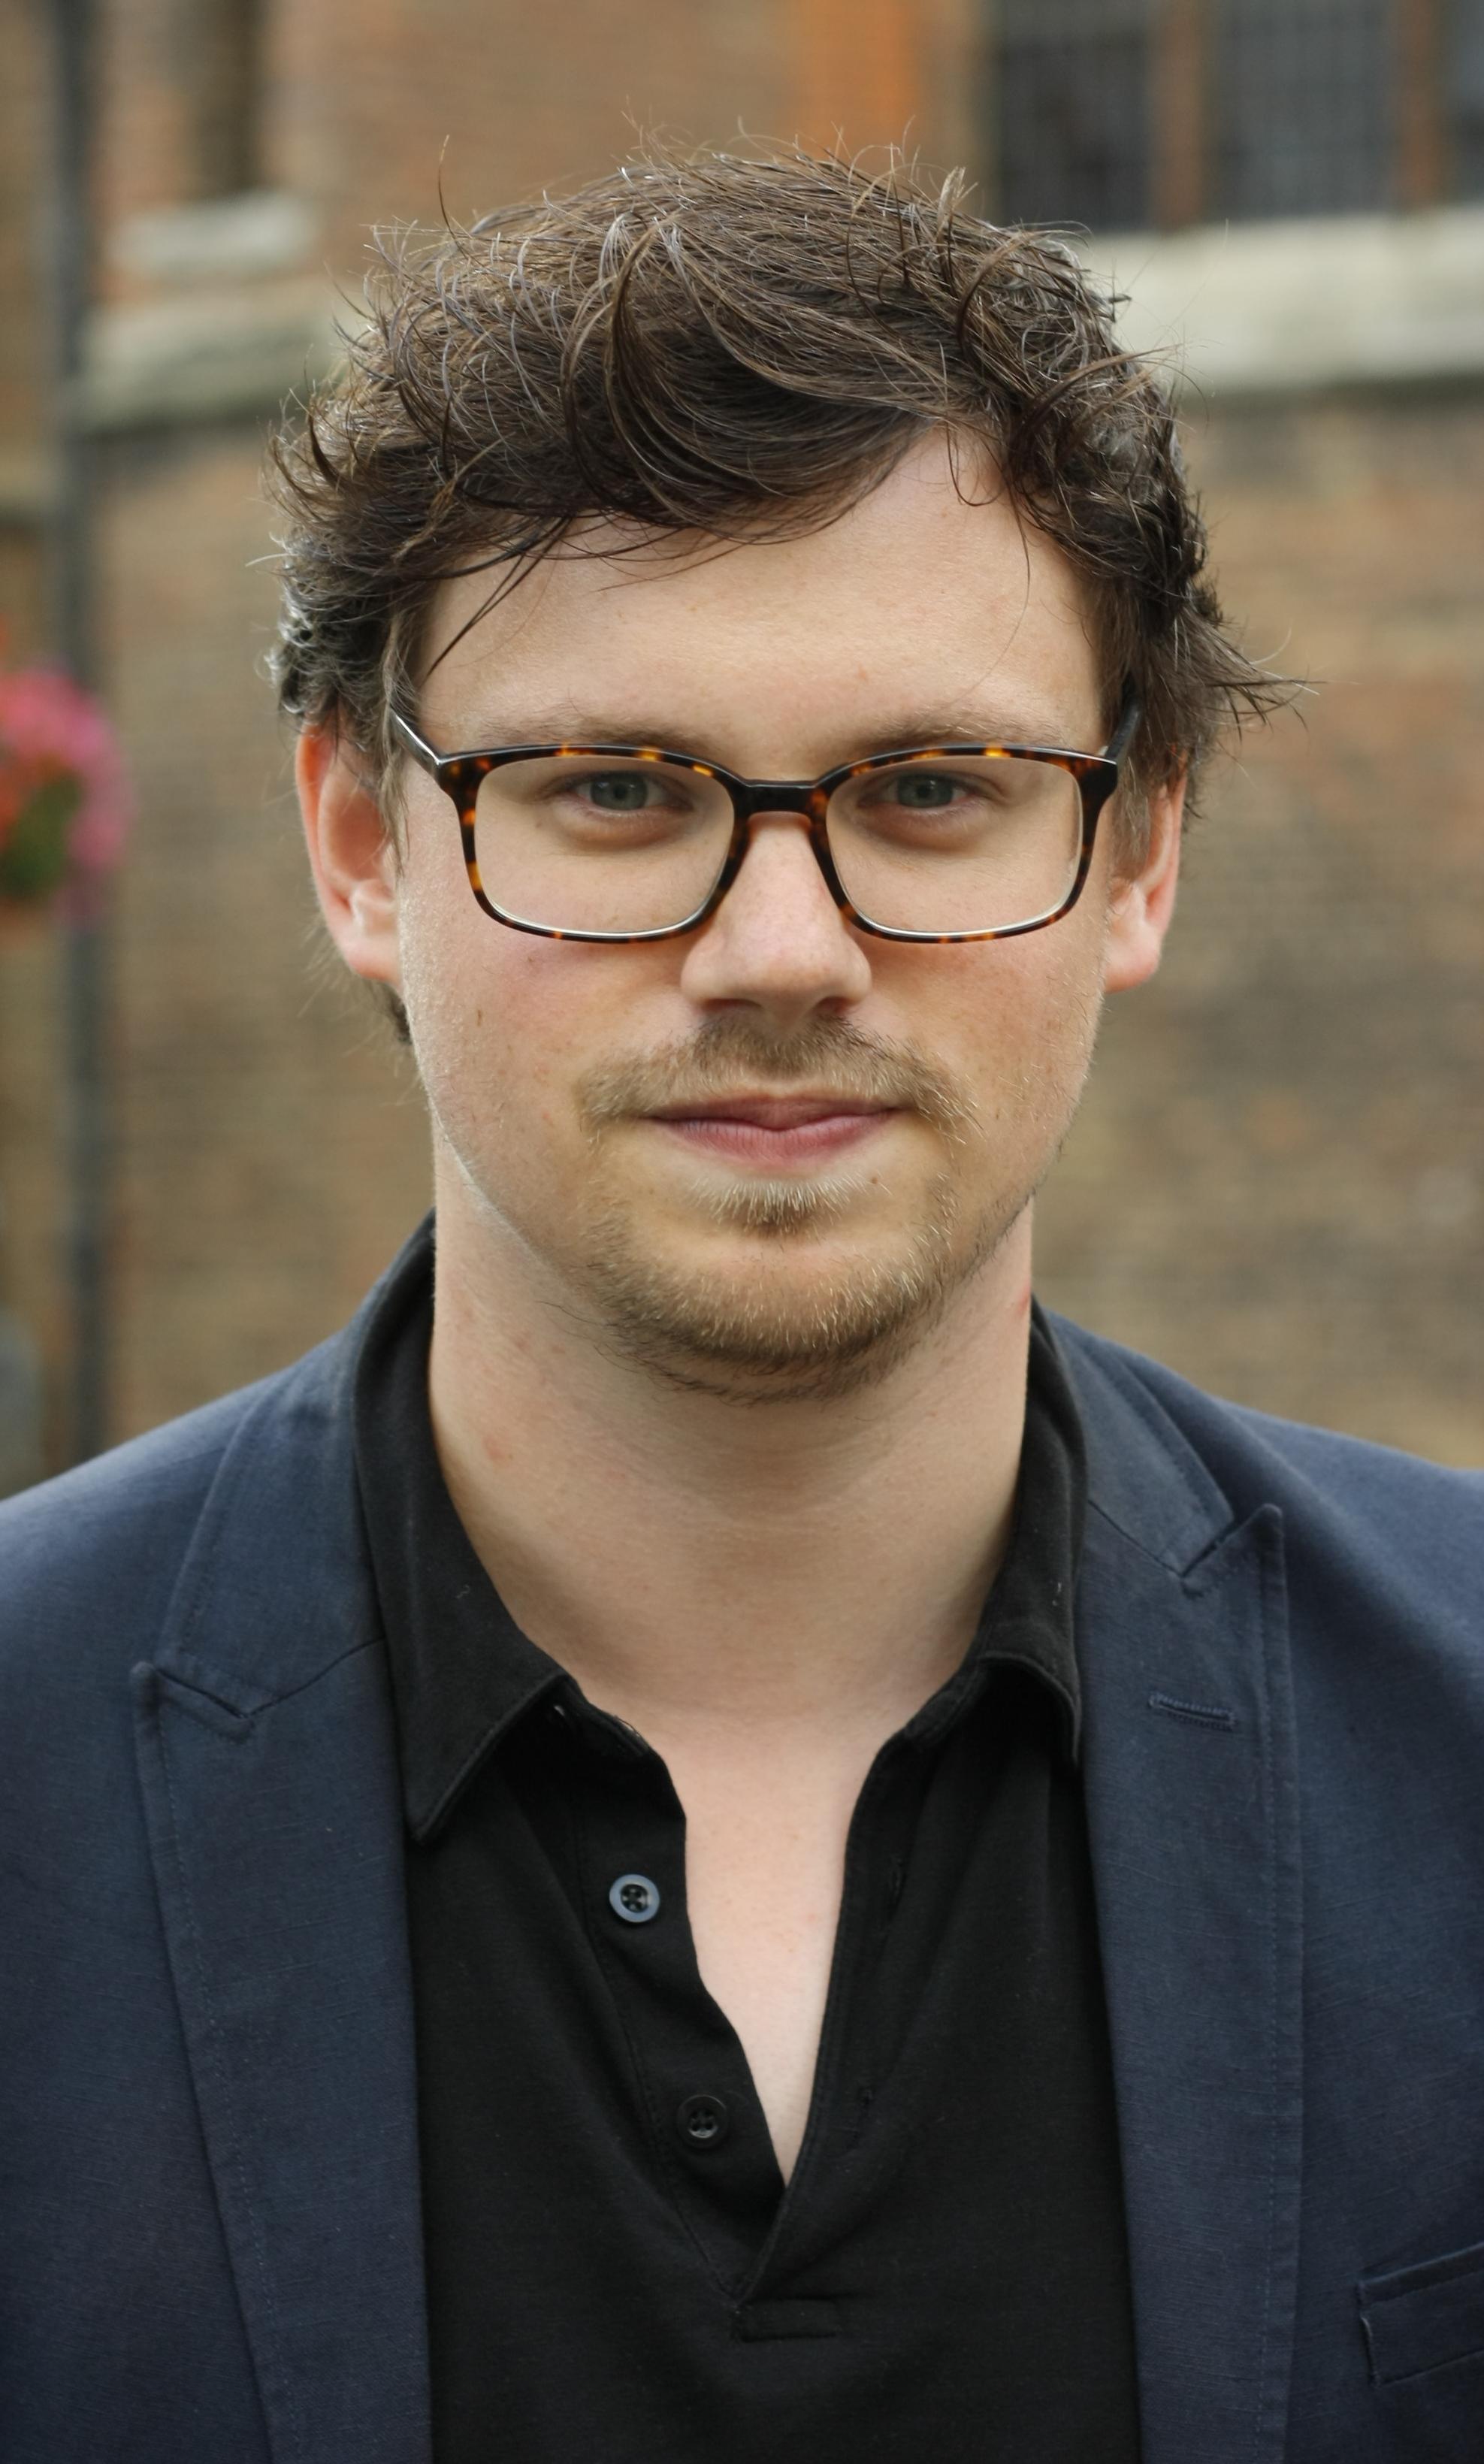 Mikel Venhovens